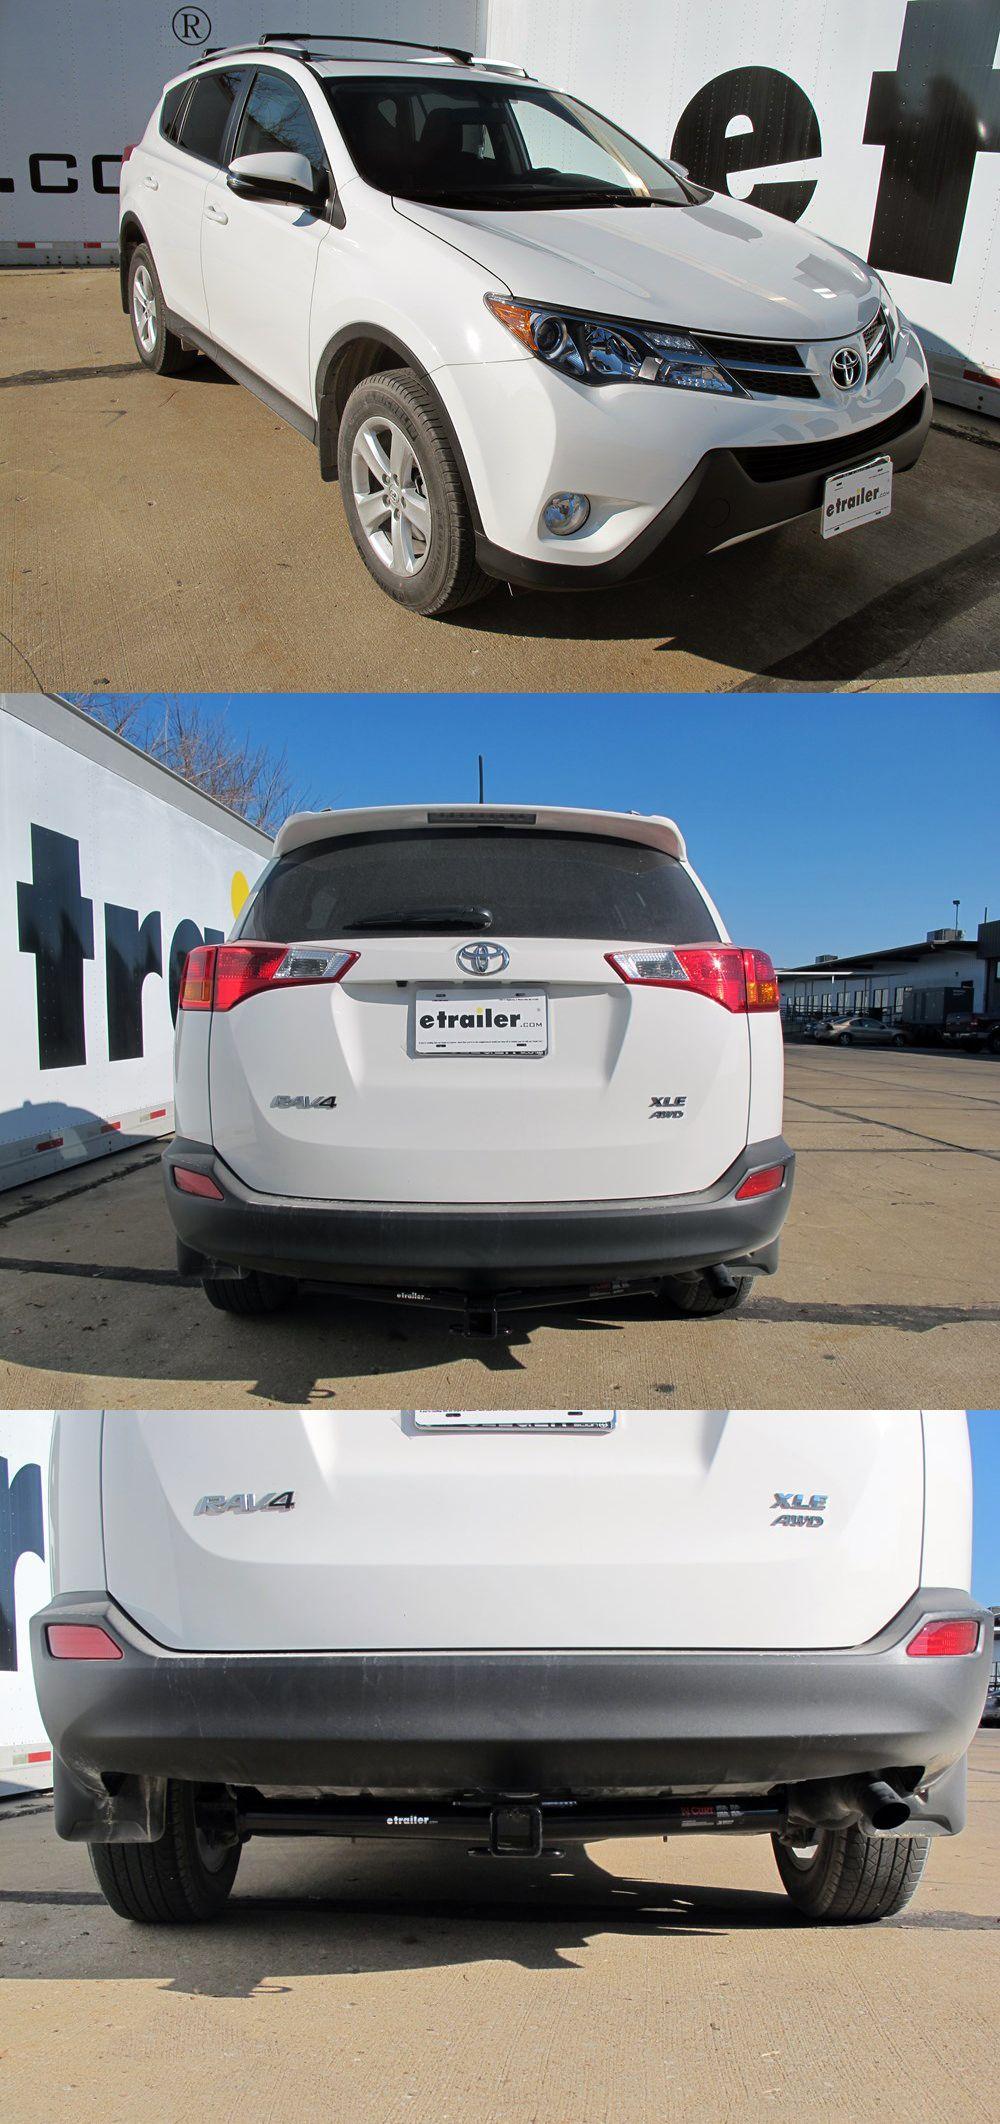 2014 Toyota Rav4 Trailer Hitch Curt Trailer Hitch Trailer Hitch Receiver Trailer Hitch Installation